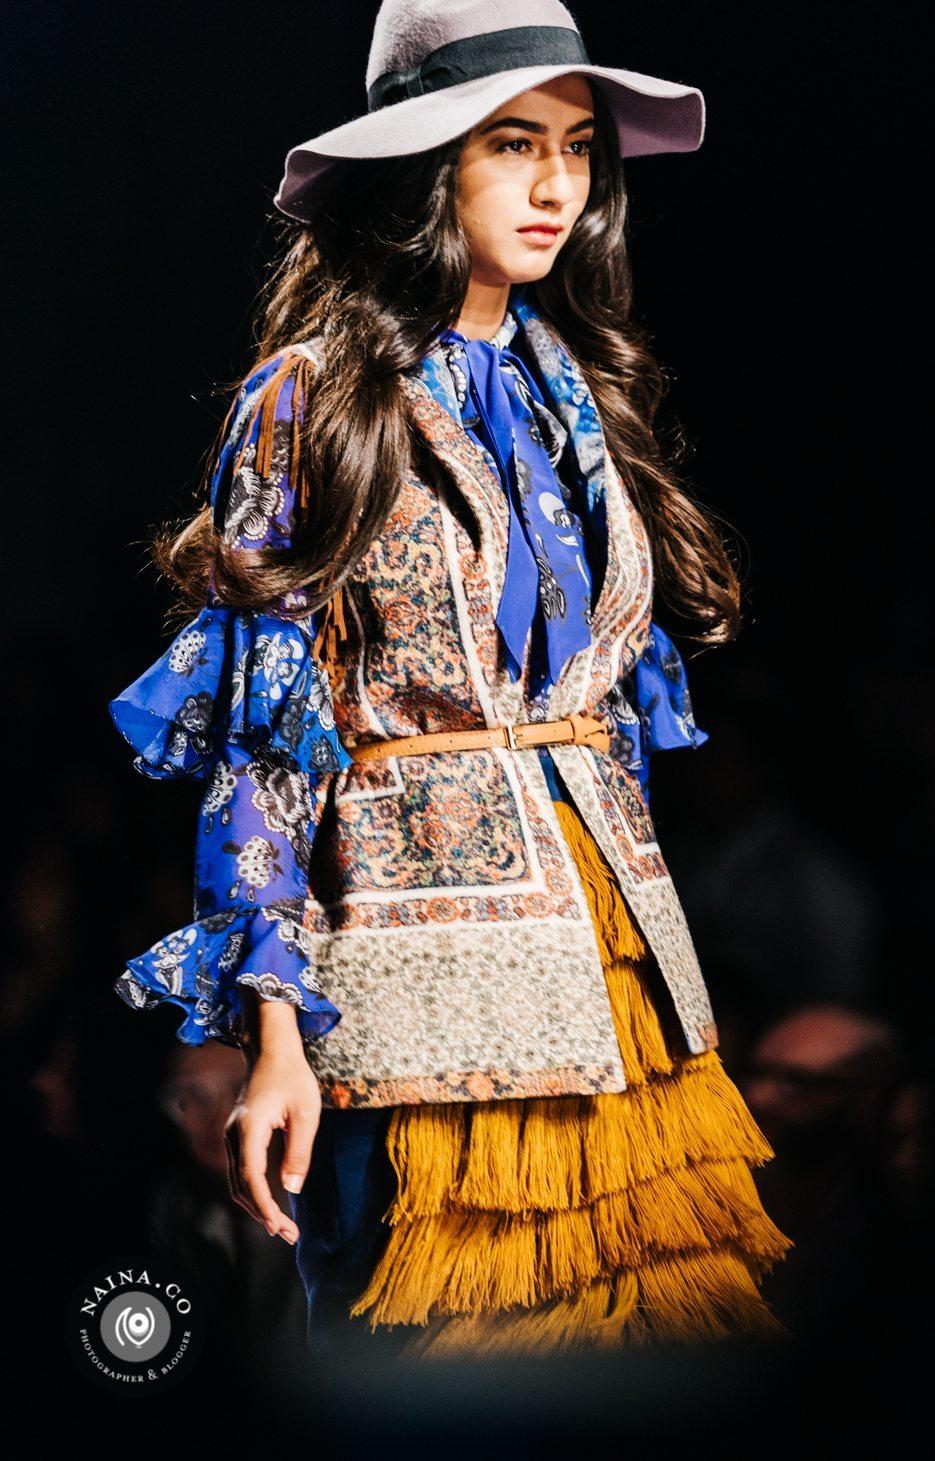 Naina.co-Raconteuse-Visuelle-Photographer-Blogger-Storyteller-Luxury-Lifestyle-AIFWAW15-Hemant-Nandita